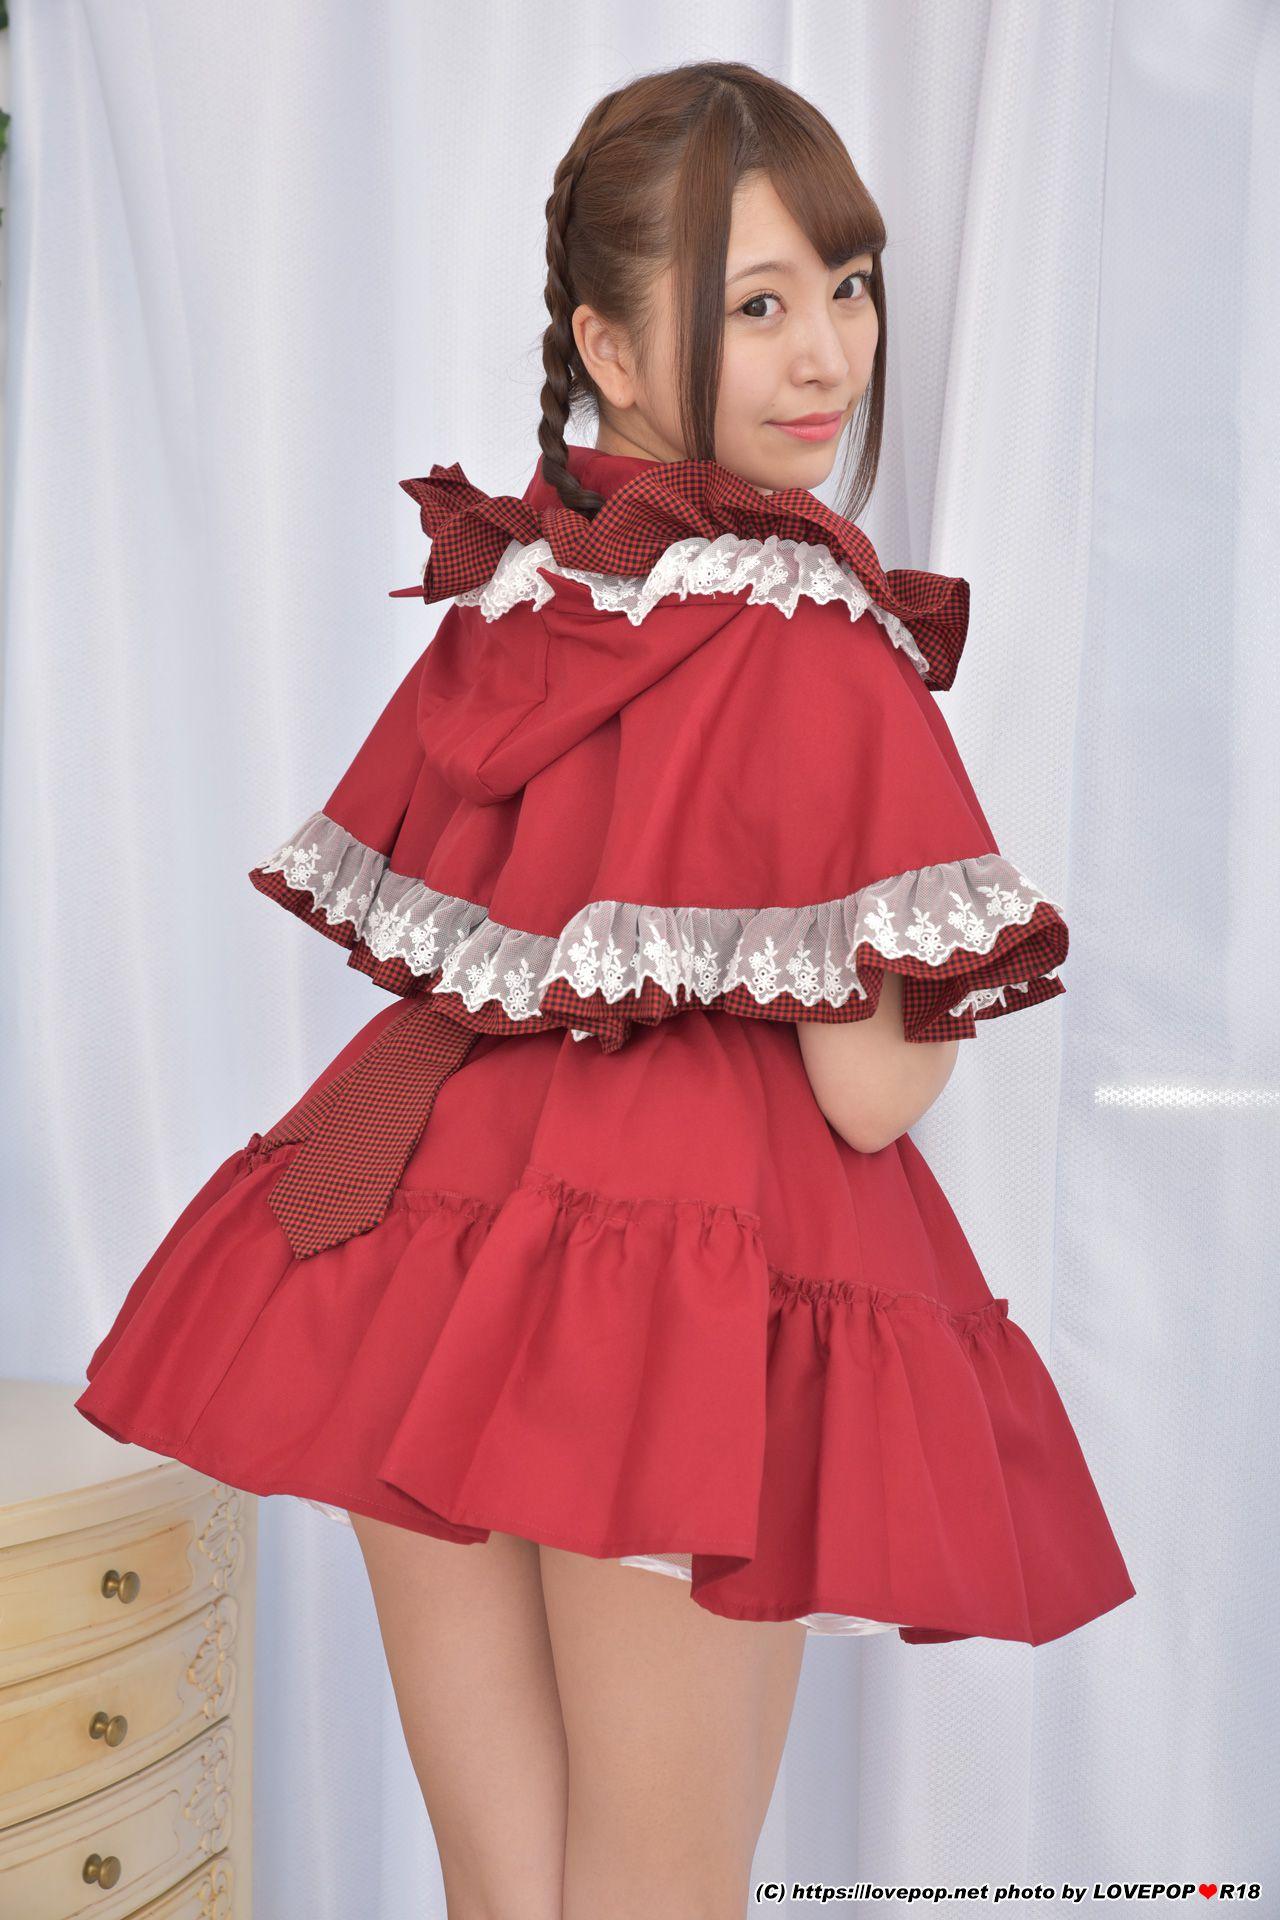 [LOVEPOP] Momoka Kato 加藤ももか Photoset 02 写真集[60P]插图(7)